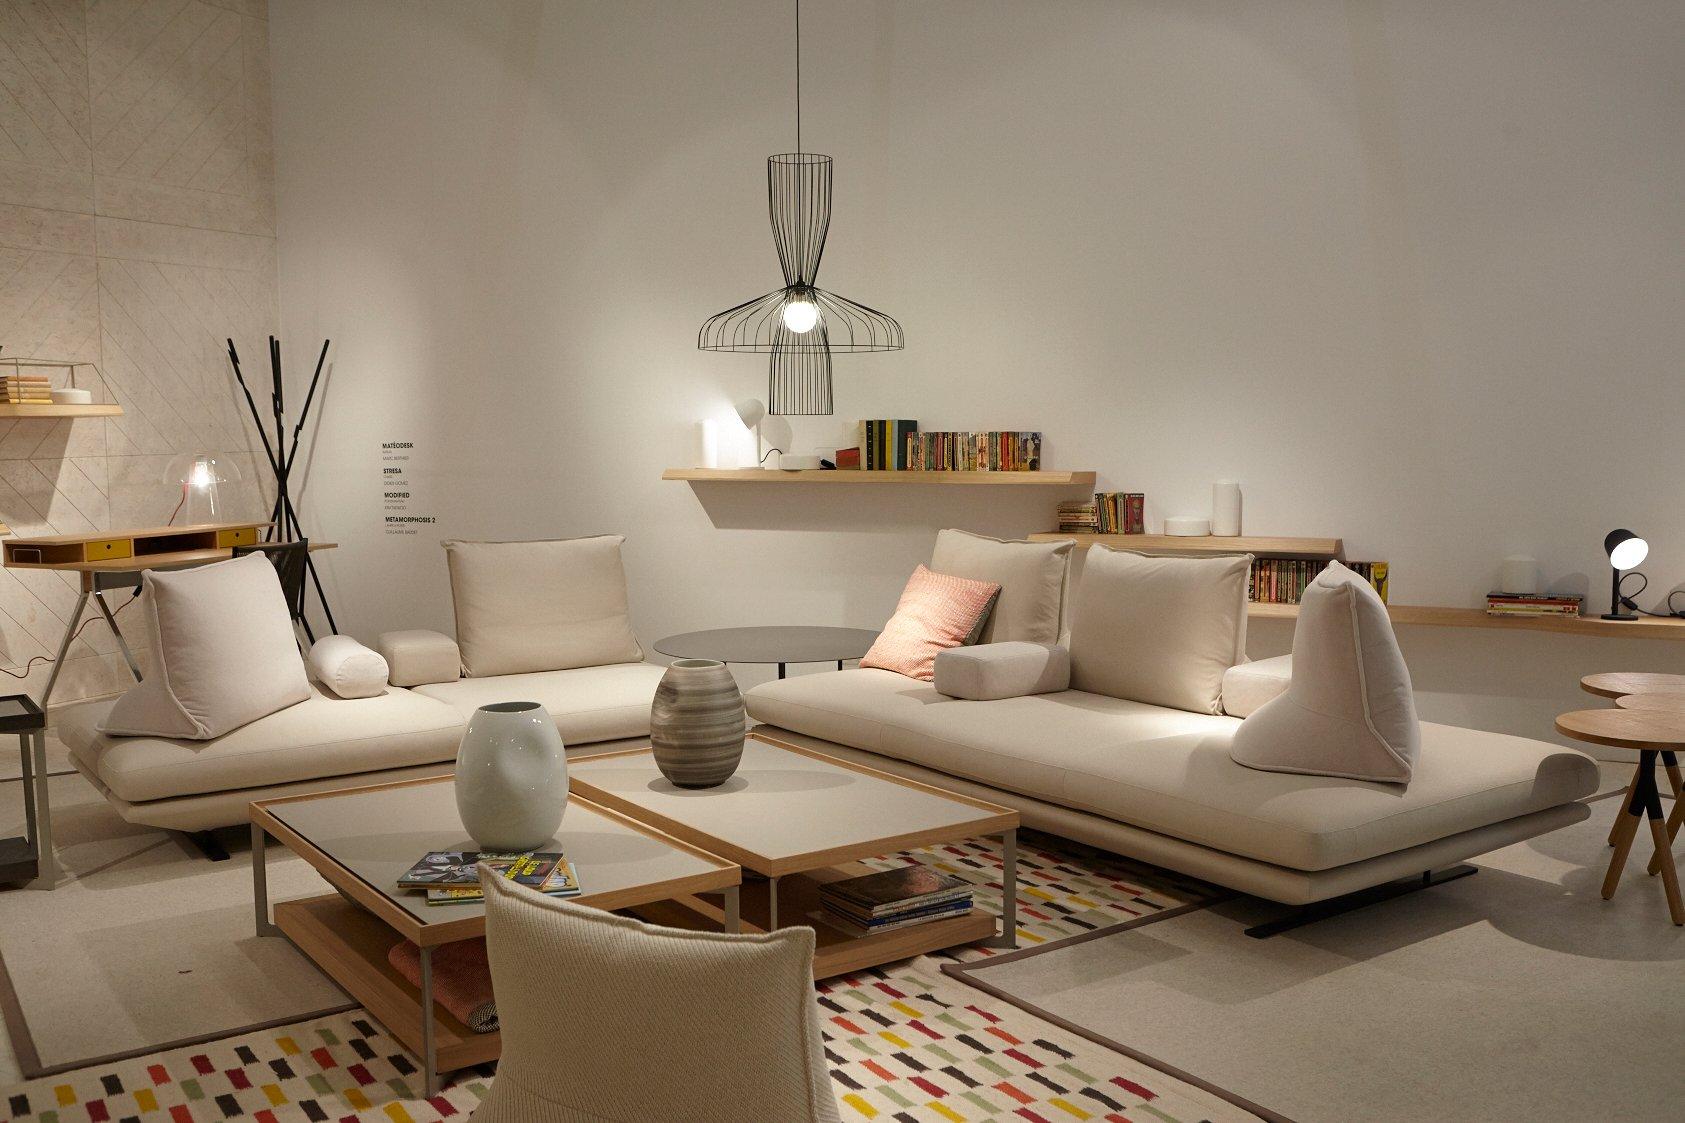 teppich cube ligne roset innenr ume und m bel ideen. Black Bedroom Furniture Sets. Home Design Ideas